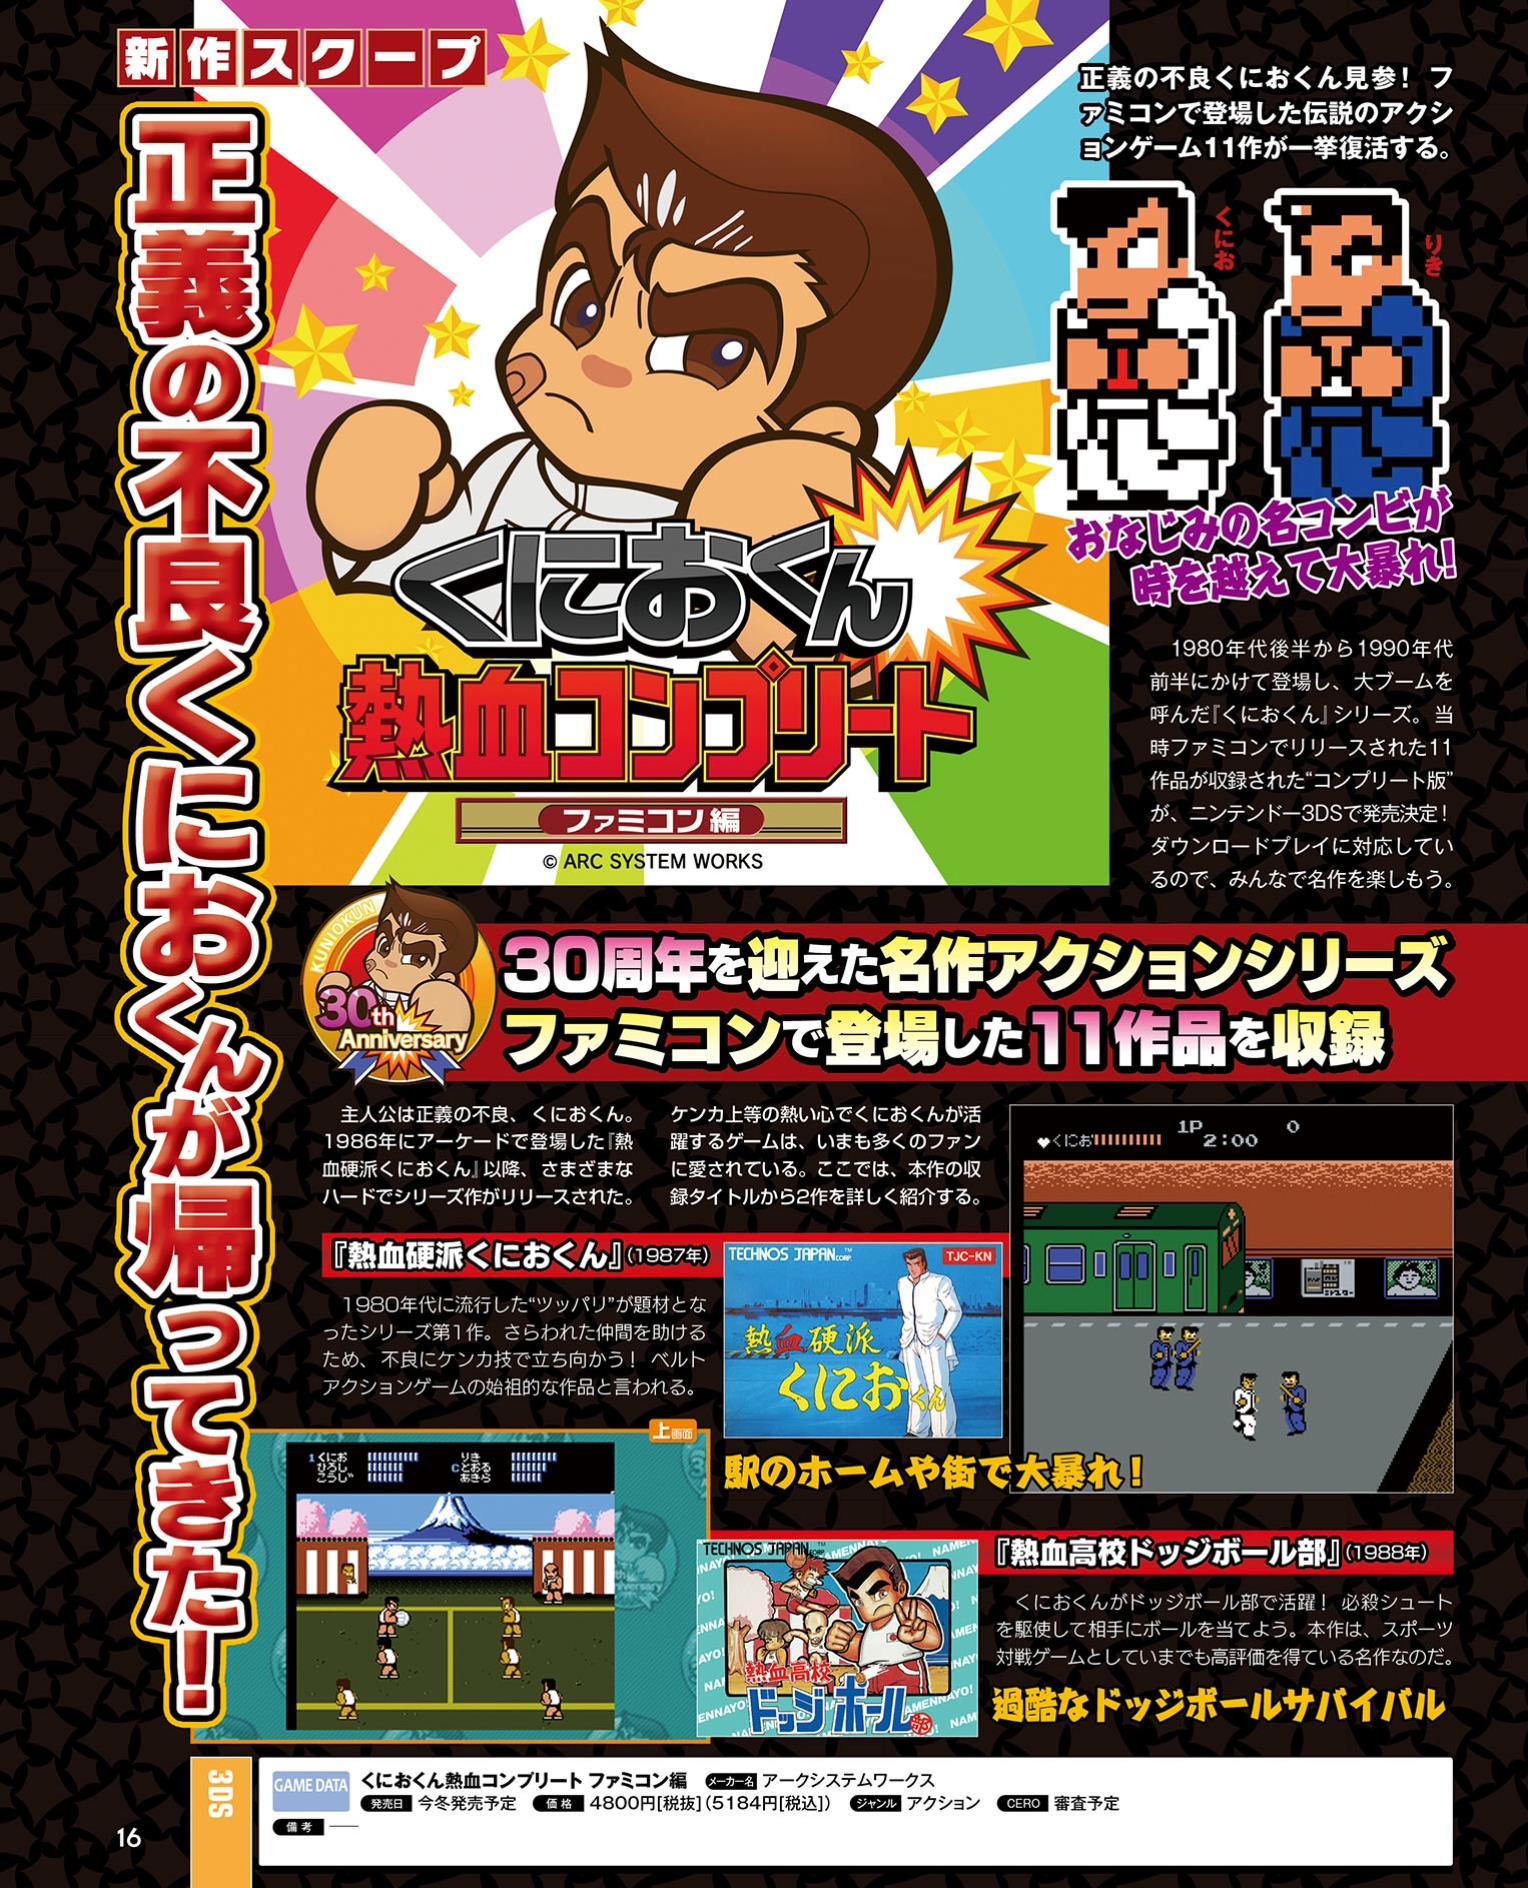 Scans roundup - Megami Meguri, SEGA 3D Fukkoku Archives 3: Final